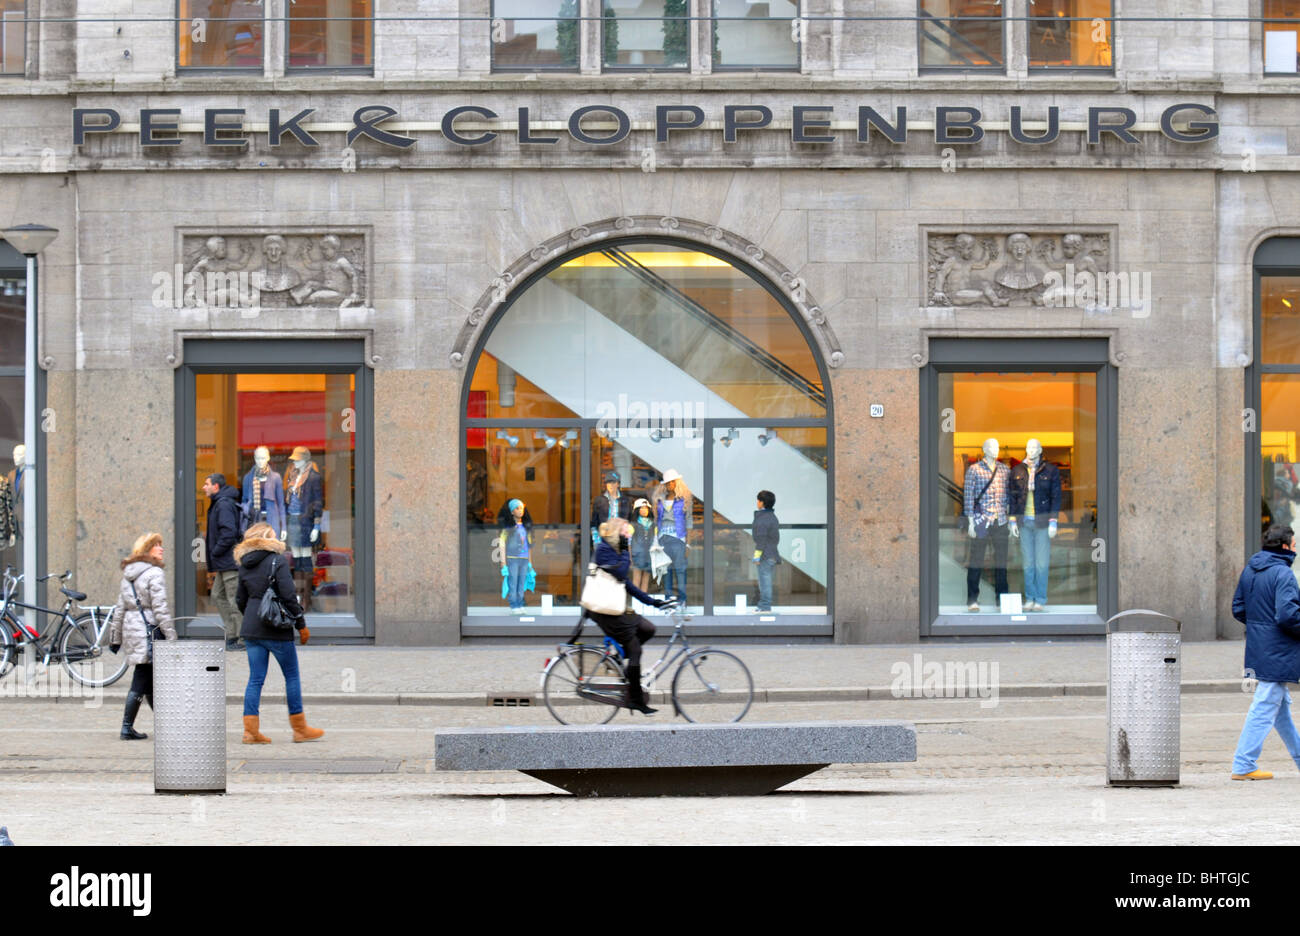 69c69bde58bc Peek & Cloppenburg store, Amsterdam, Holland, Netherlands Stock ...